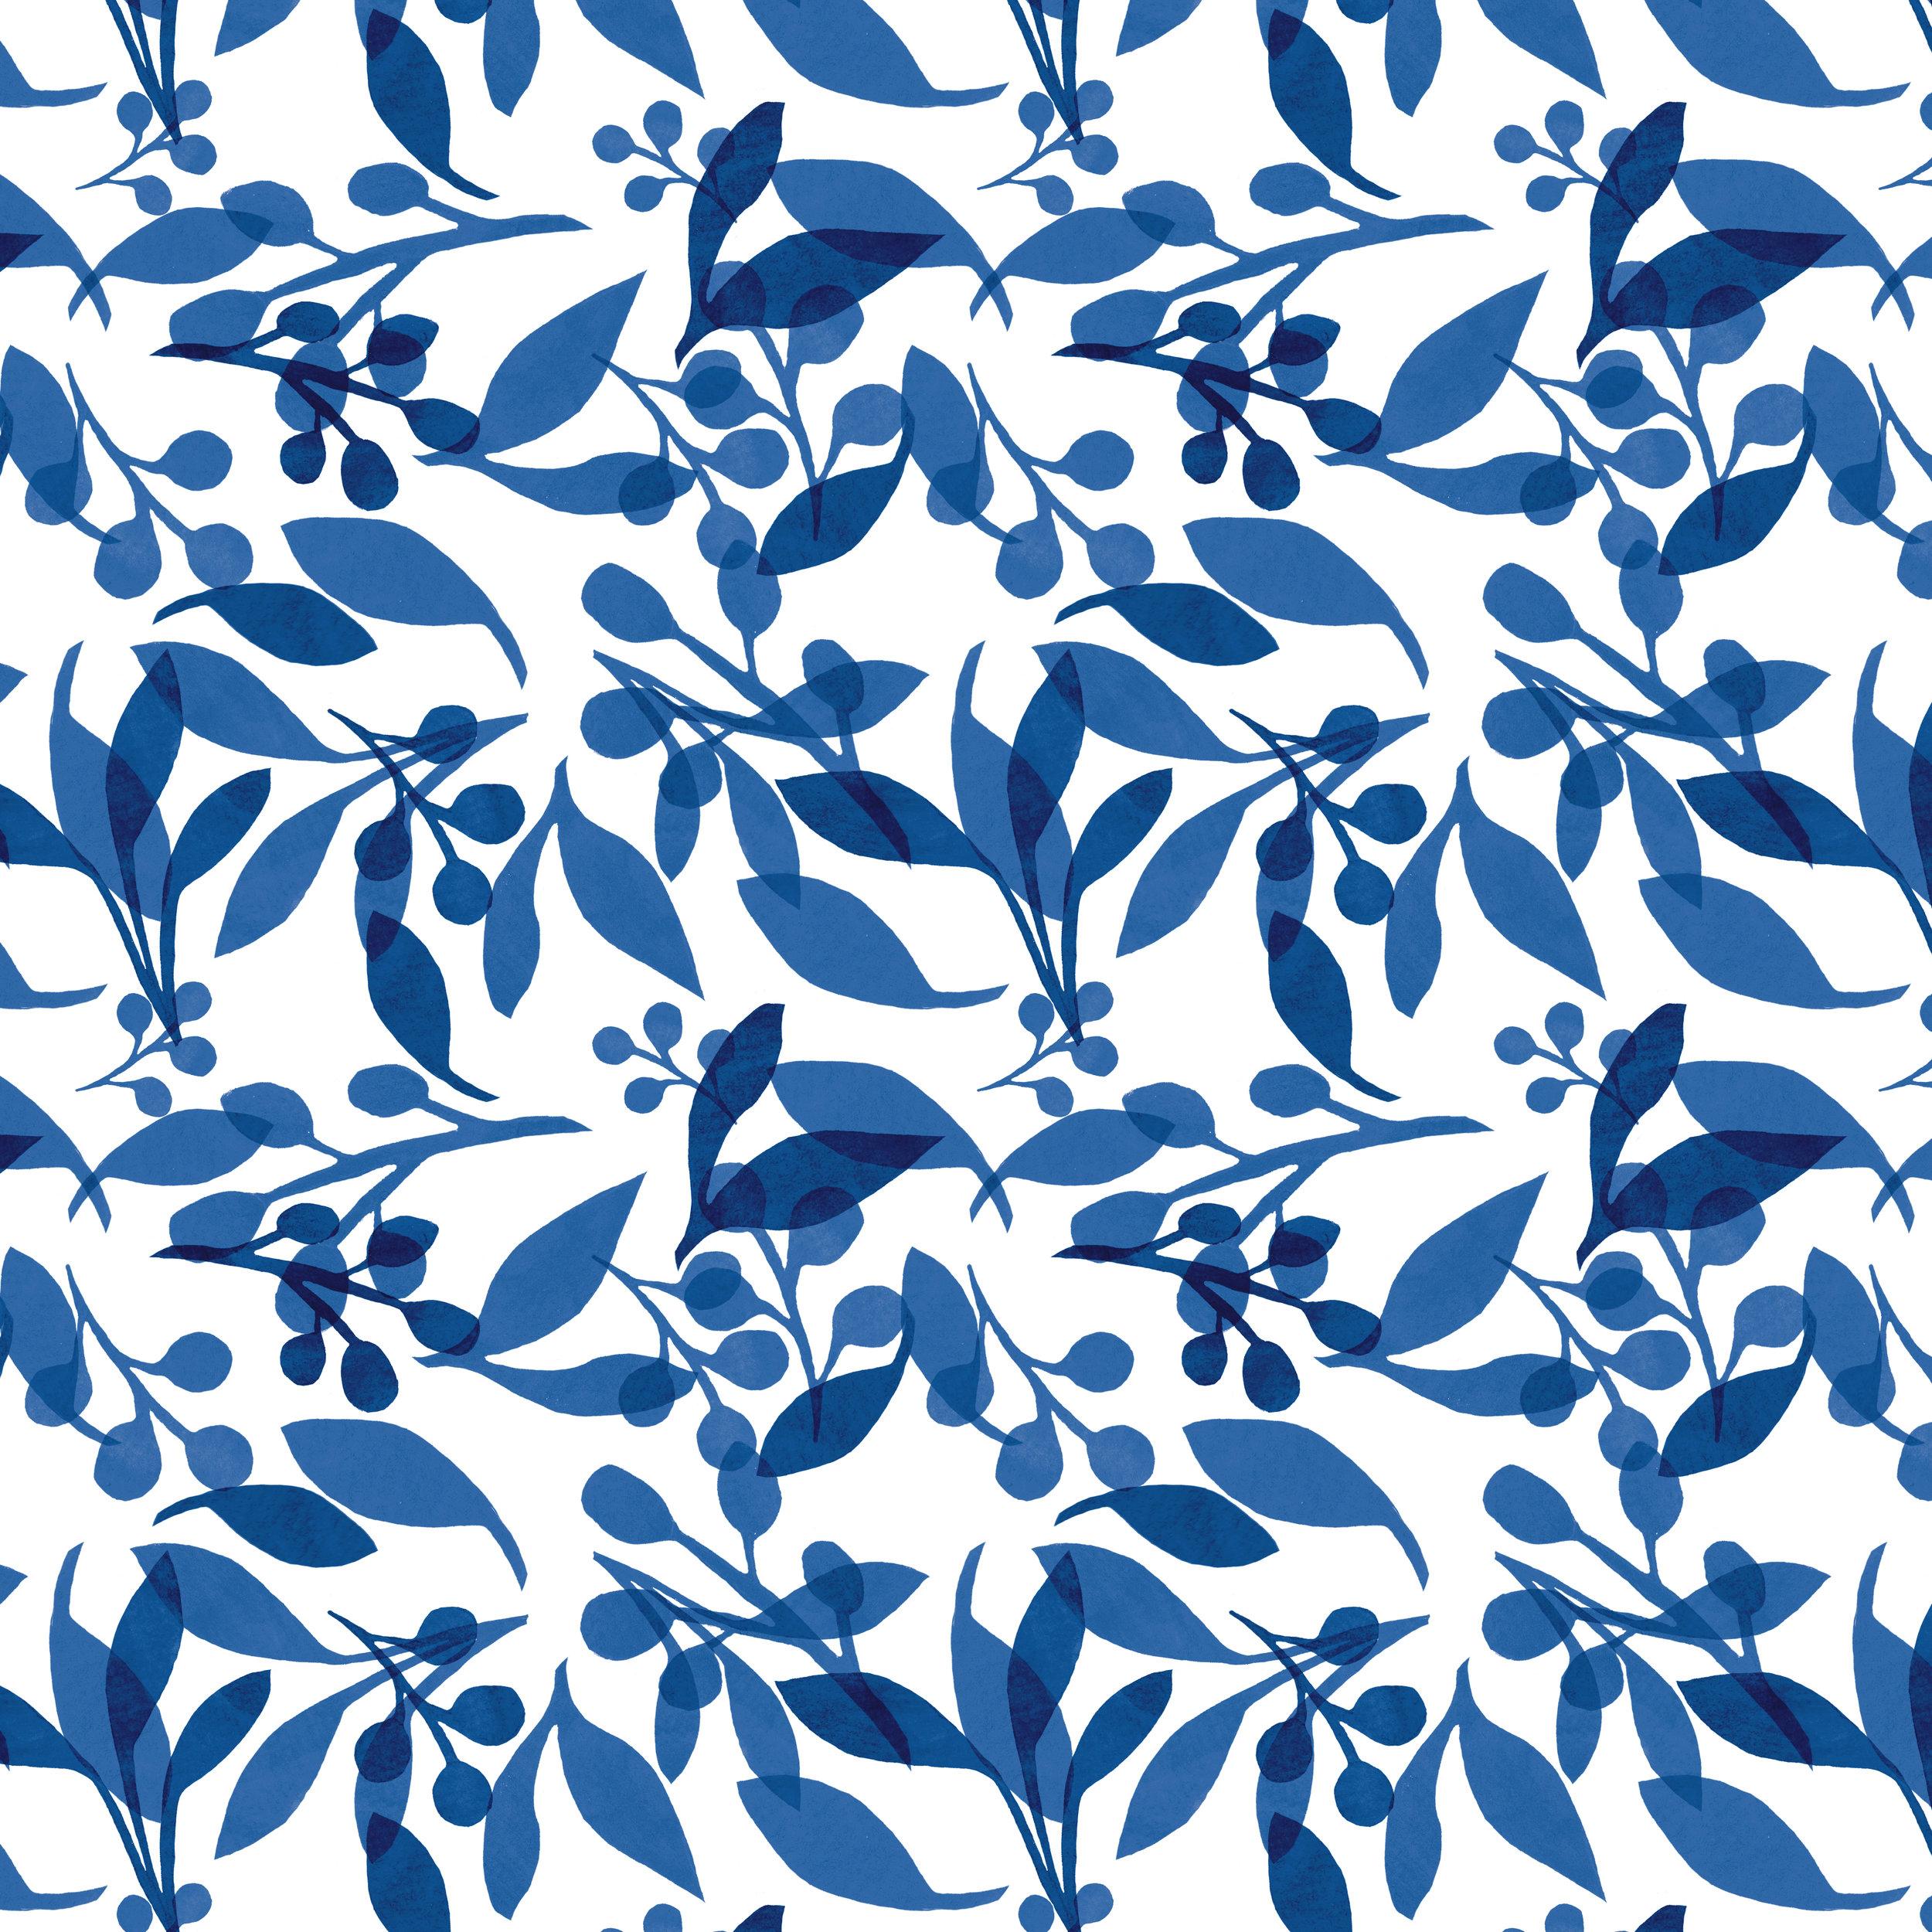 elizatodd-floral-blue-pattern.jpg